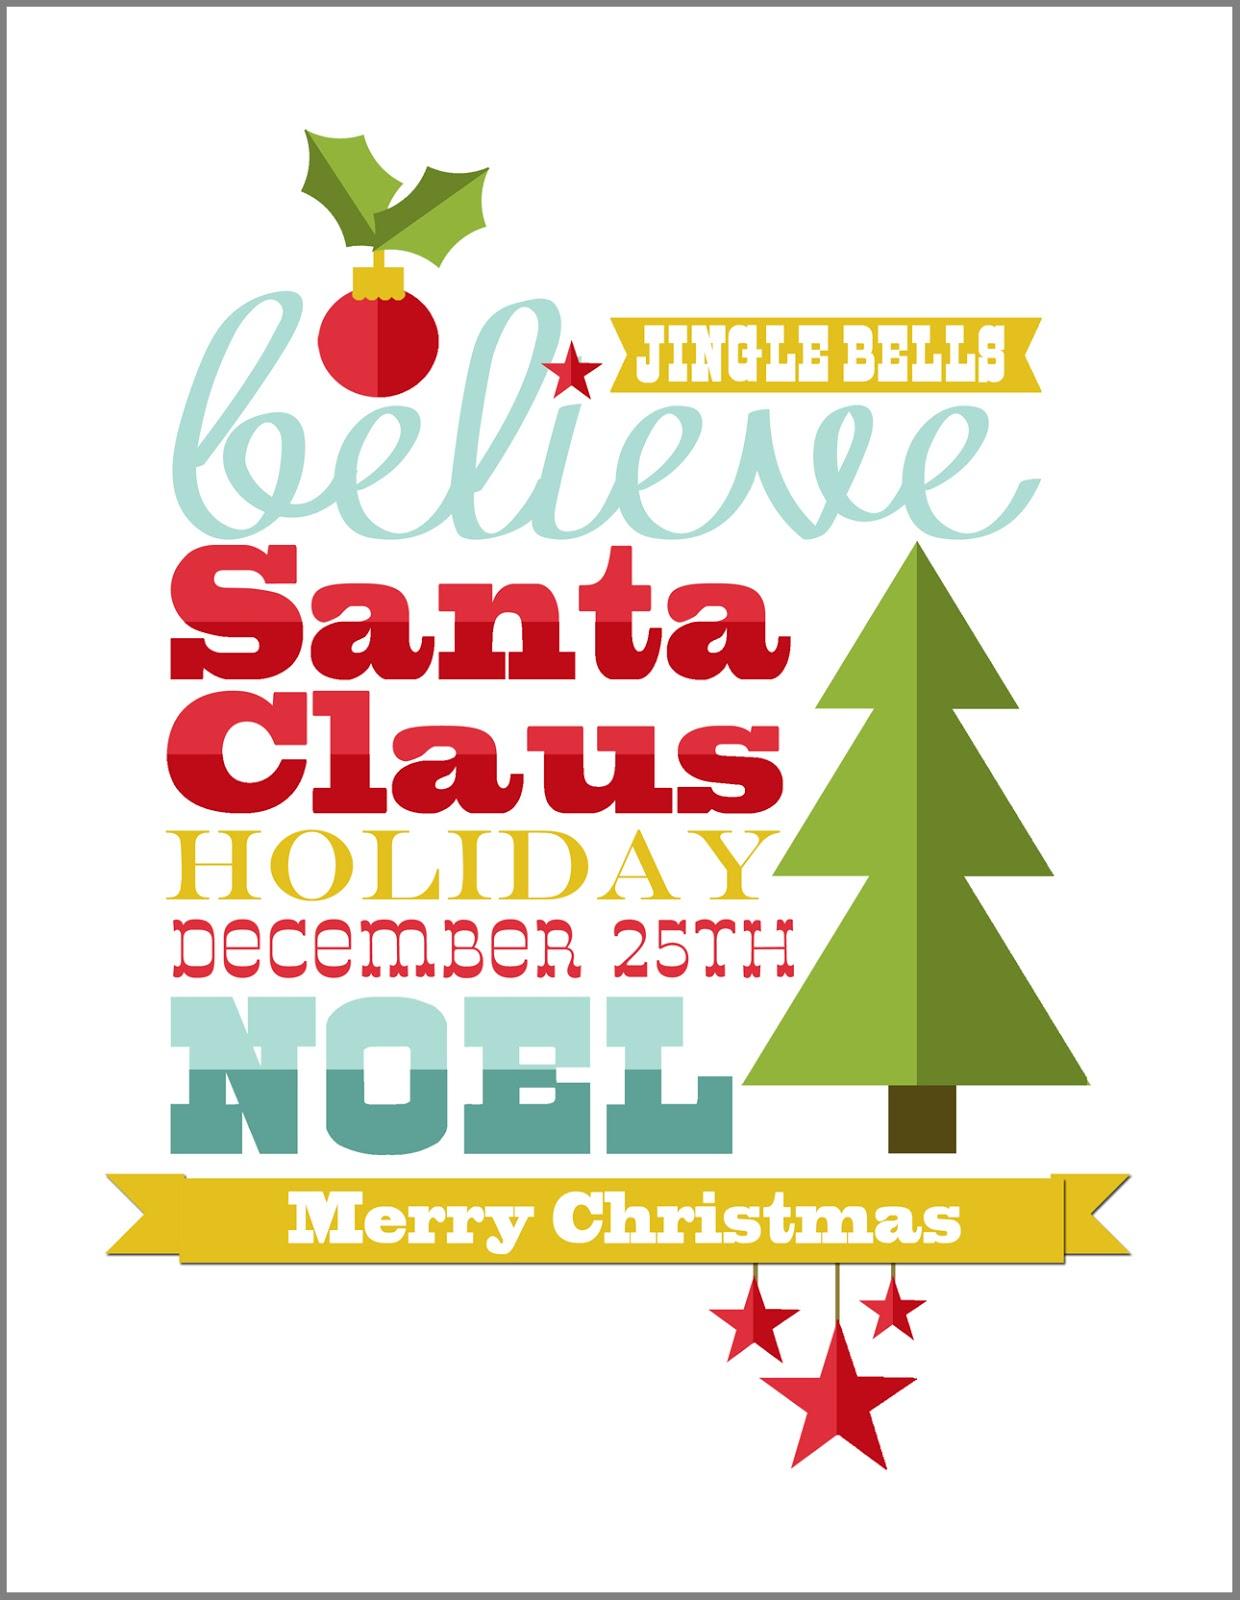 Christmas Subway Art Free Printable.Free Christmas Subway Art Printable Jen Gallacher